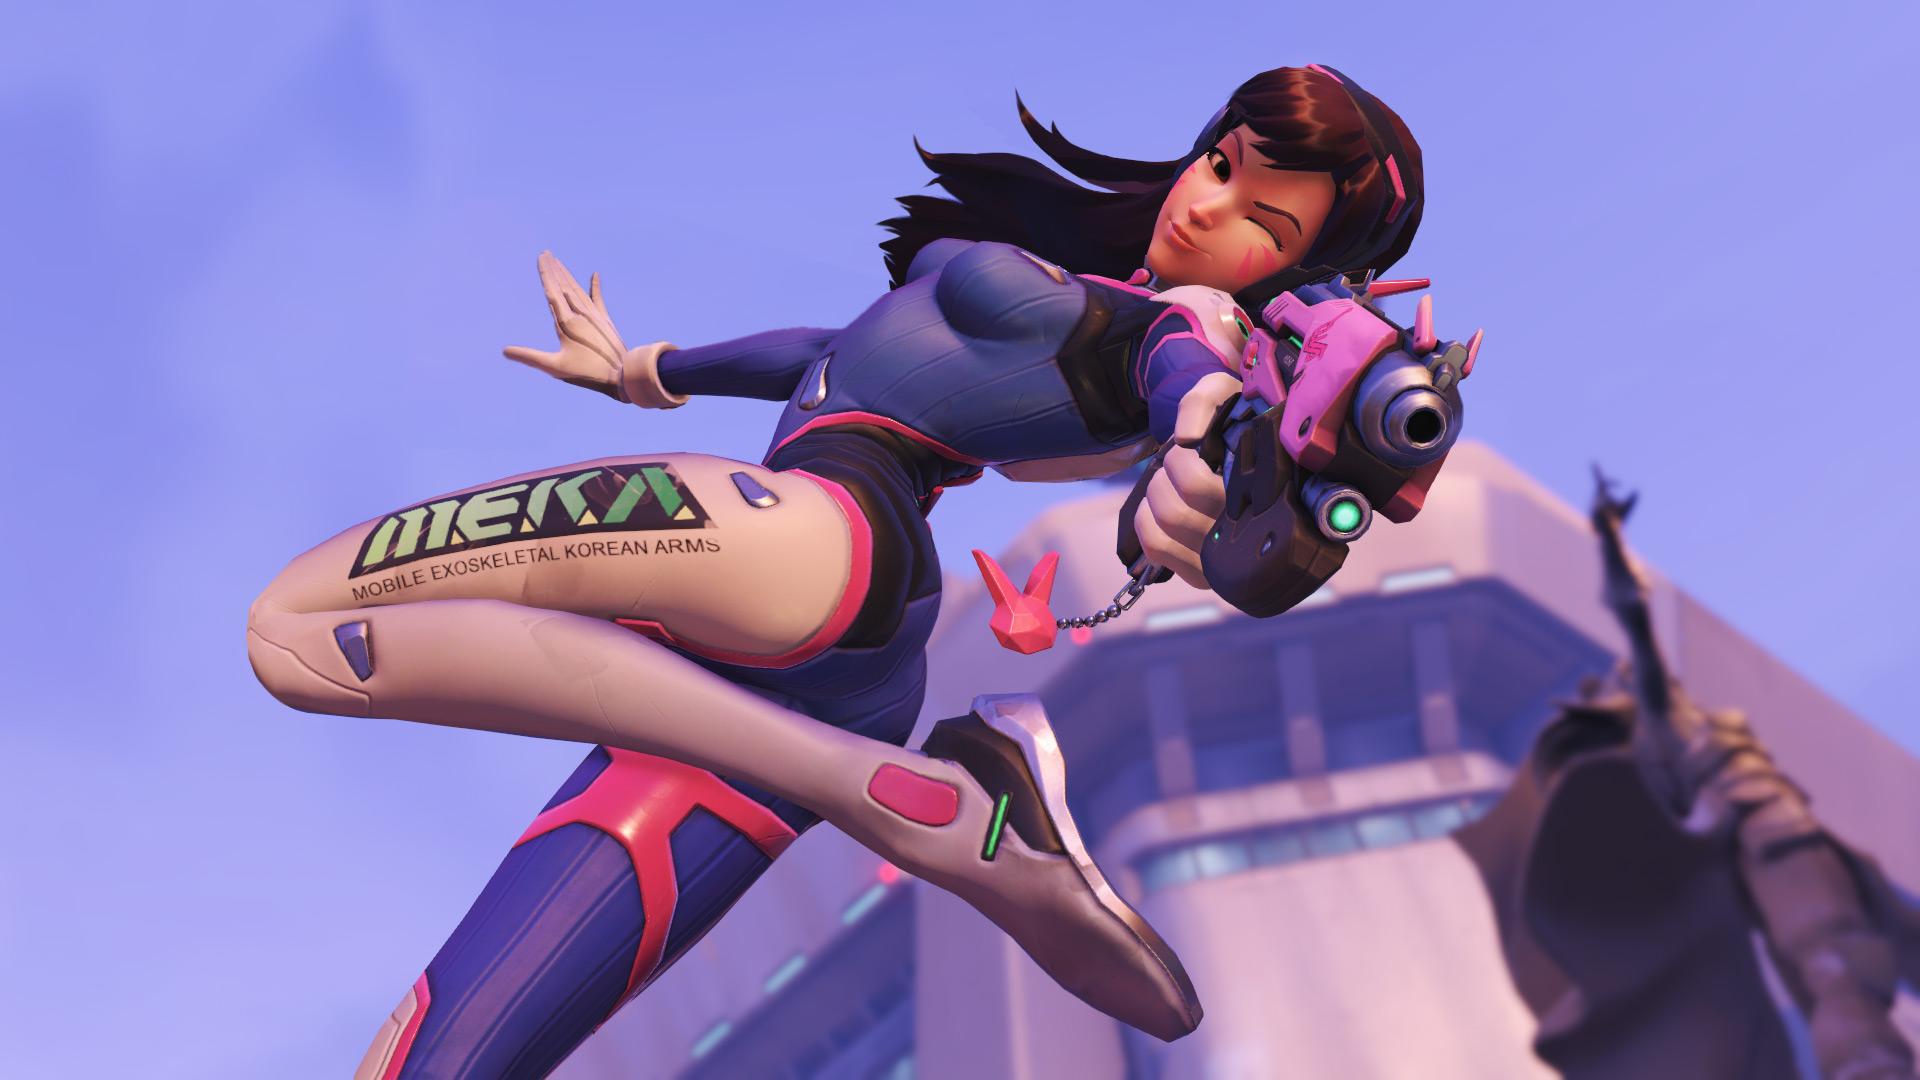 Overwatch's gamer girl hero inspires a feminist movement (update)